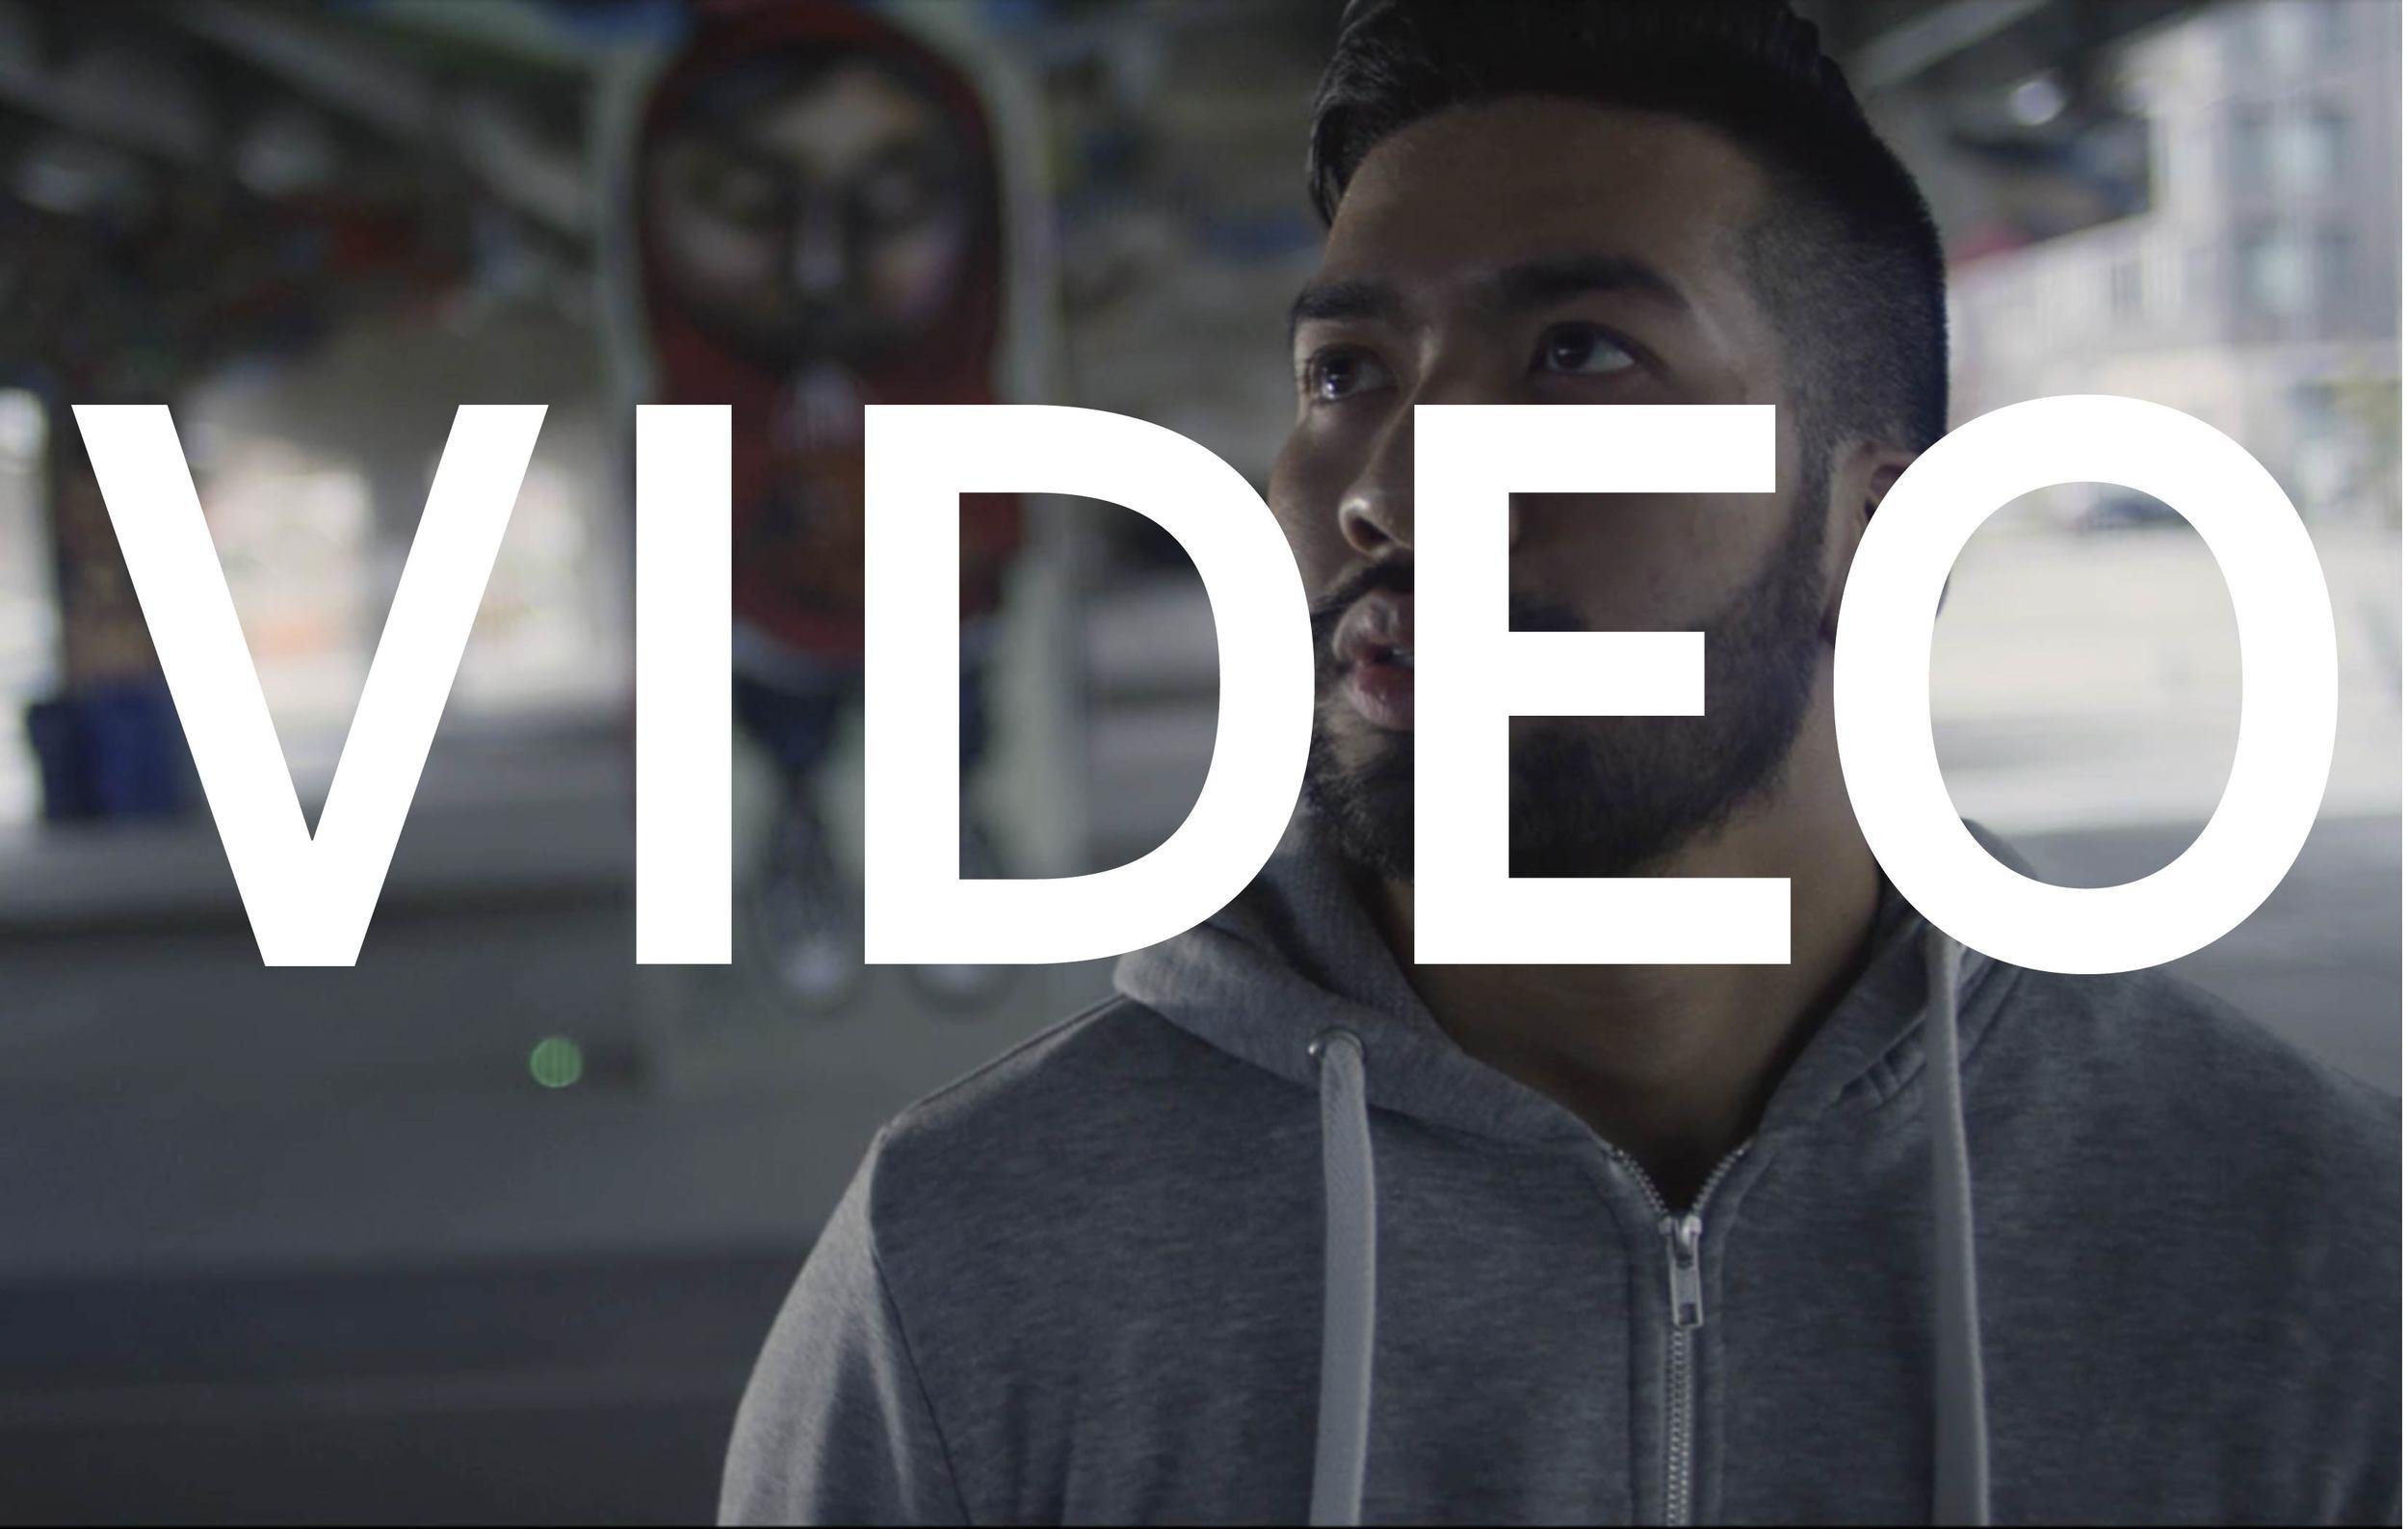 videoimage1